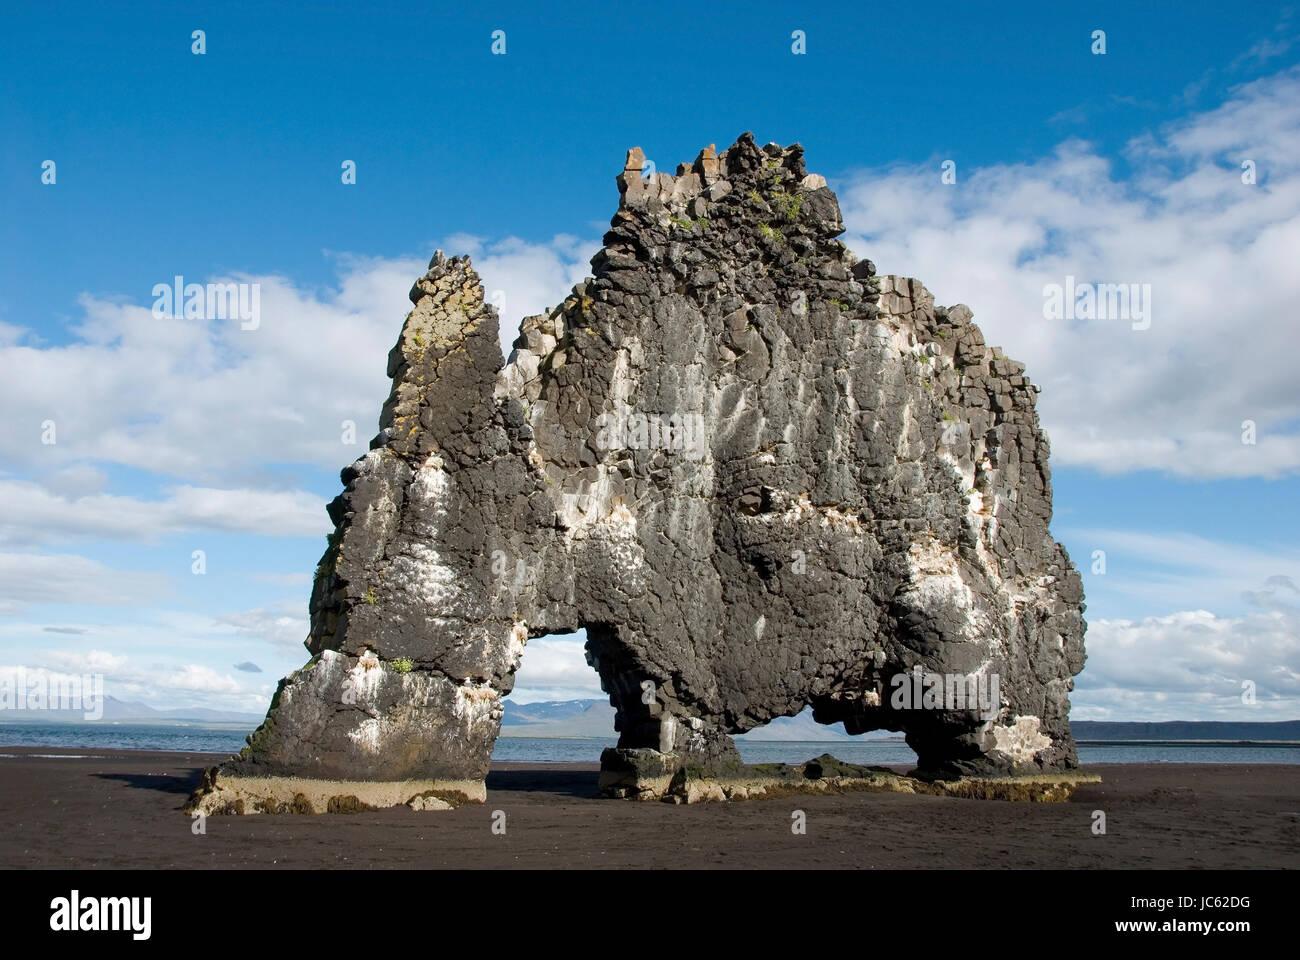 Europa, Island, Halbinsel Vatnsnes, Hvítserkur, Vogel rockt, Europa, Insel, Halbinsel Vatnsnes, Vogelfelsen Stockbild